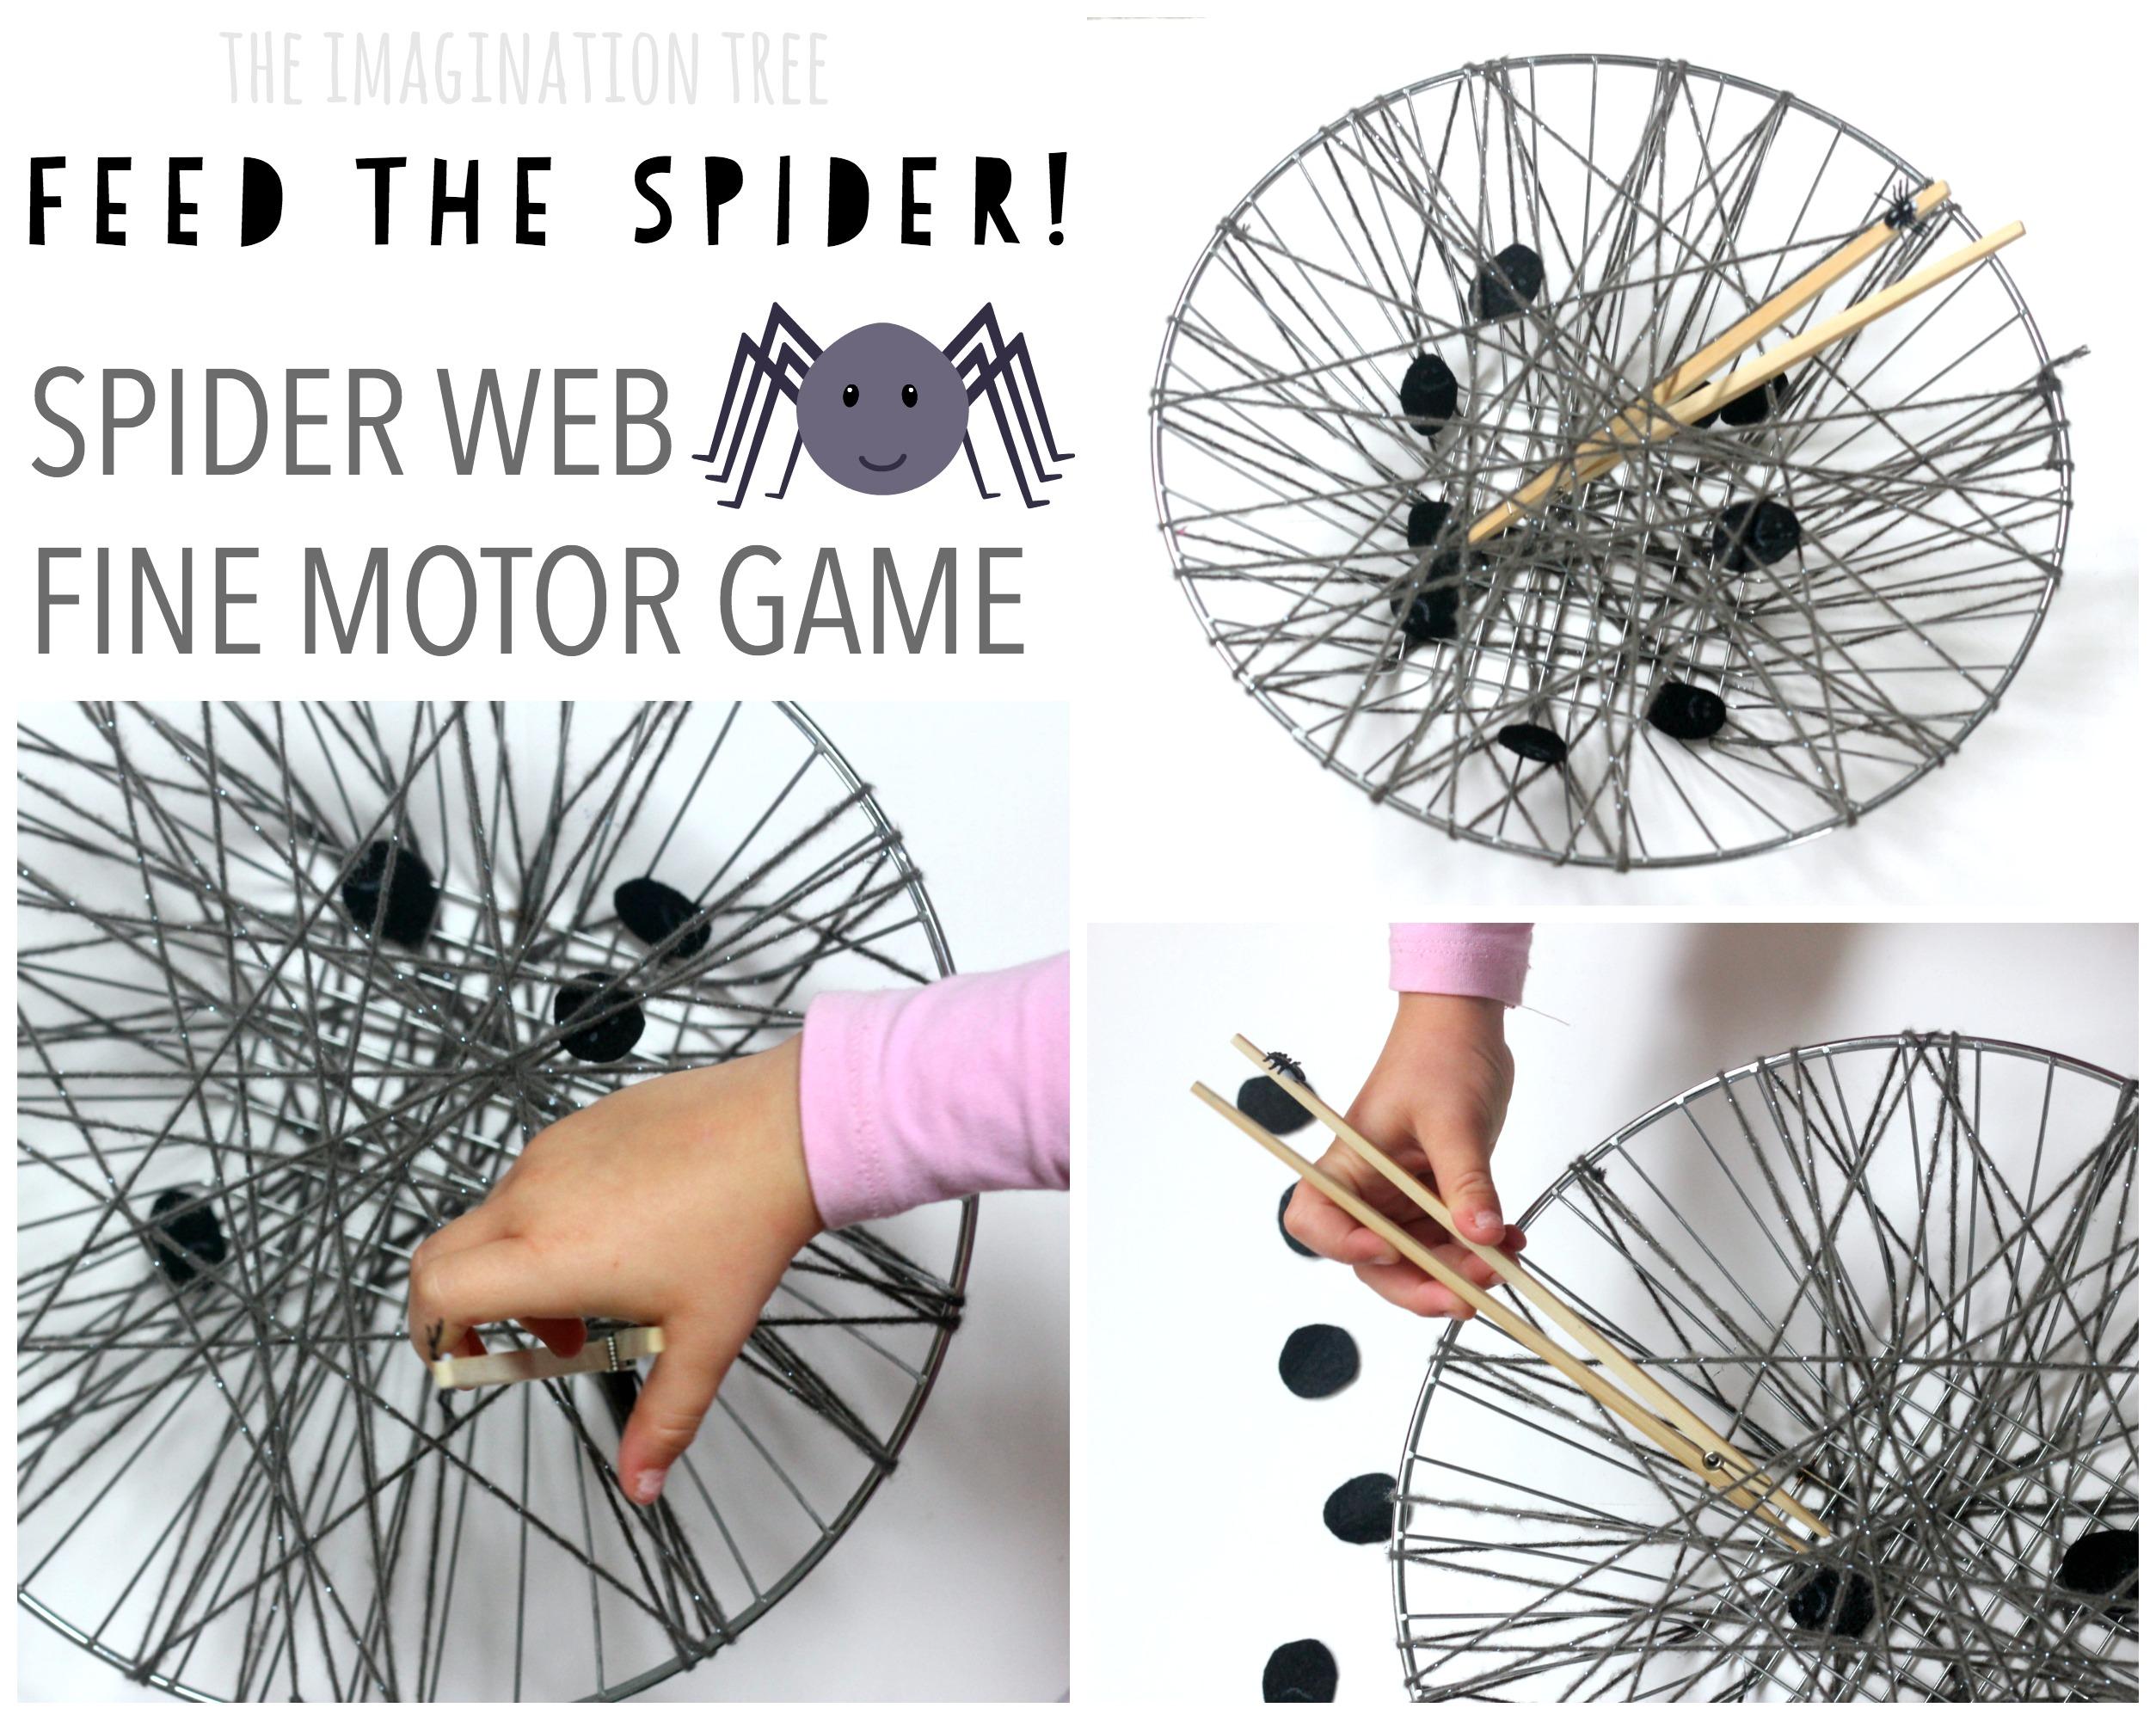 Spider Web Fine Motor Game The Imagination Tree